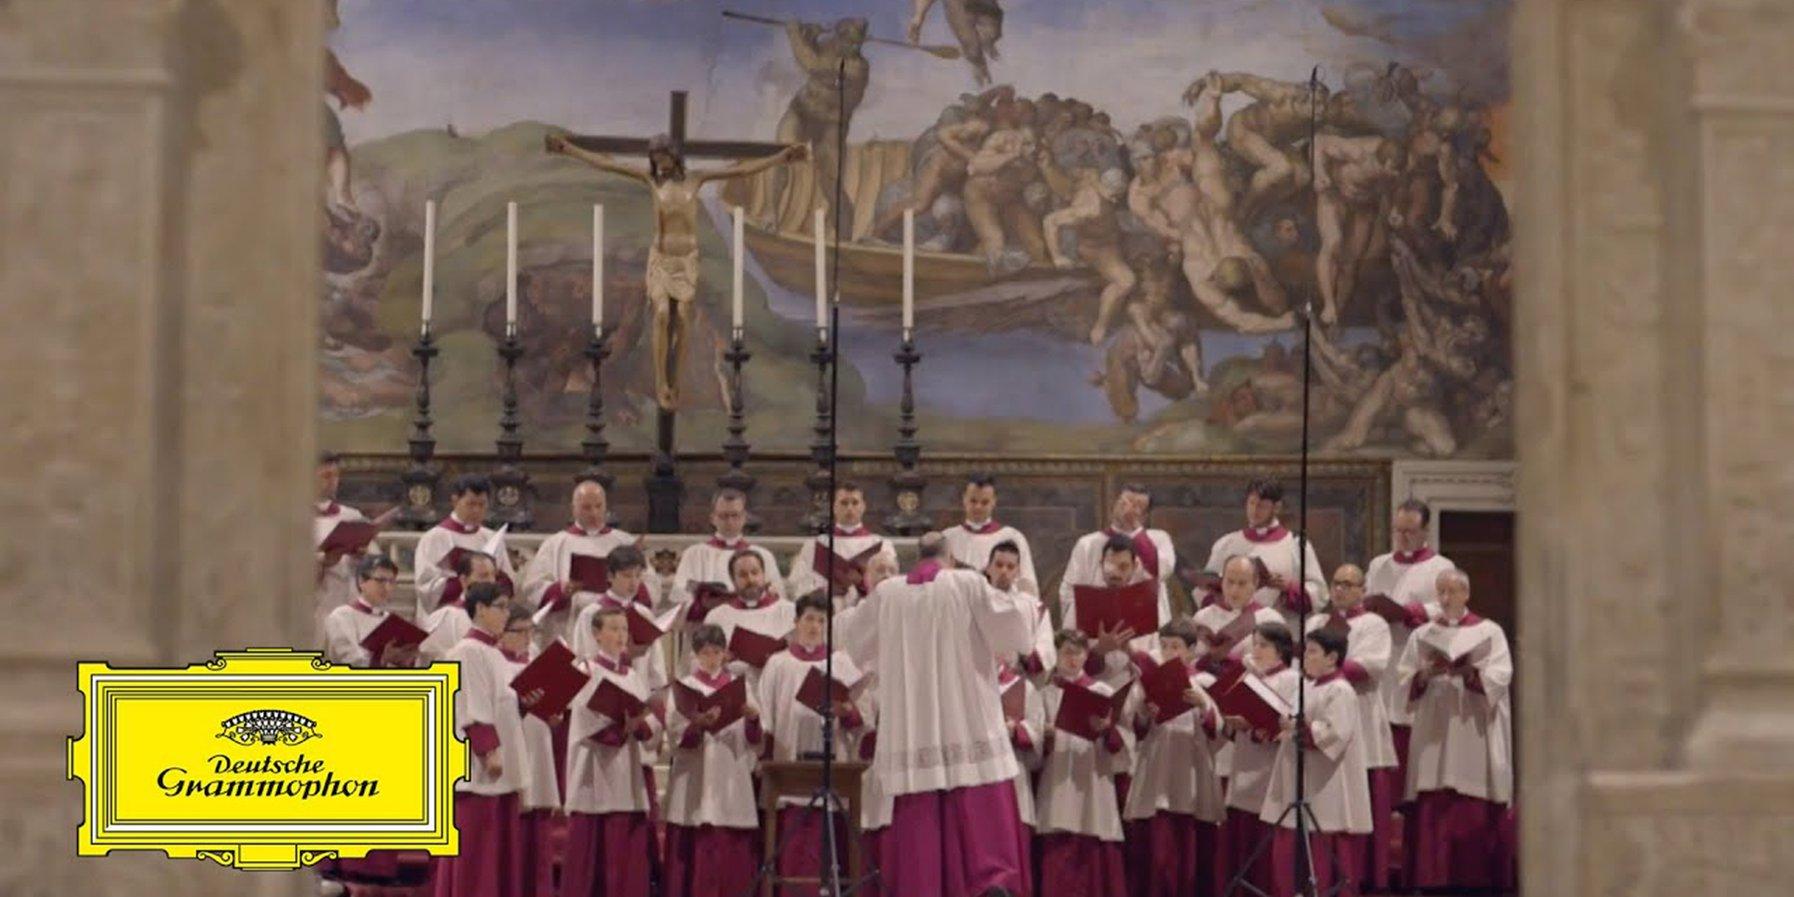 Sistine Chapel Choir / Palestrina: Missa Papae Marcelli